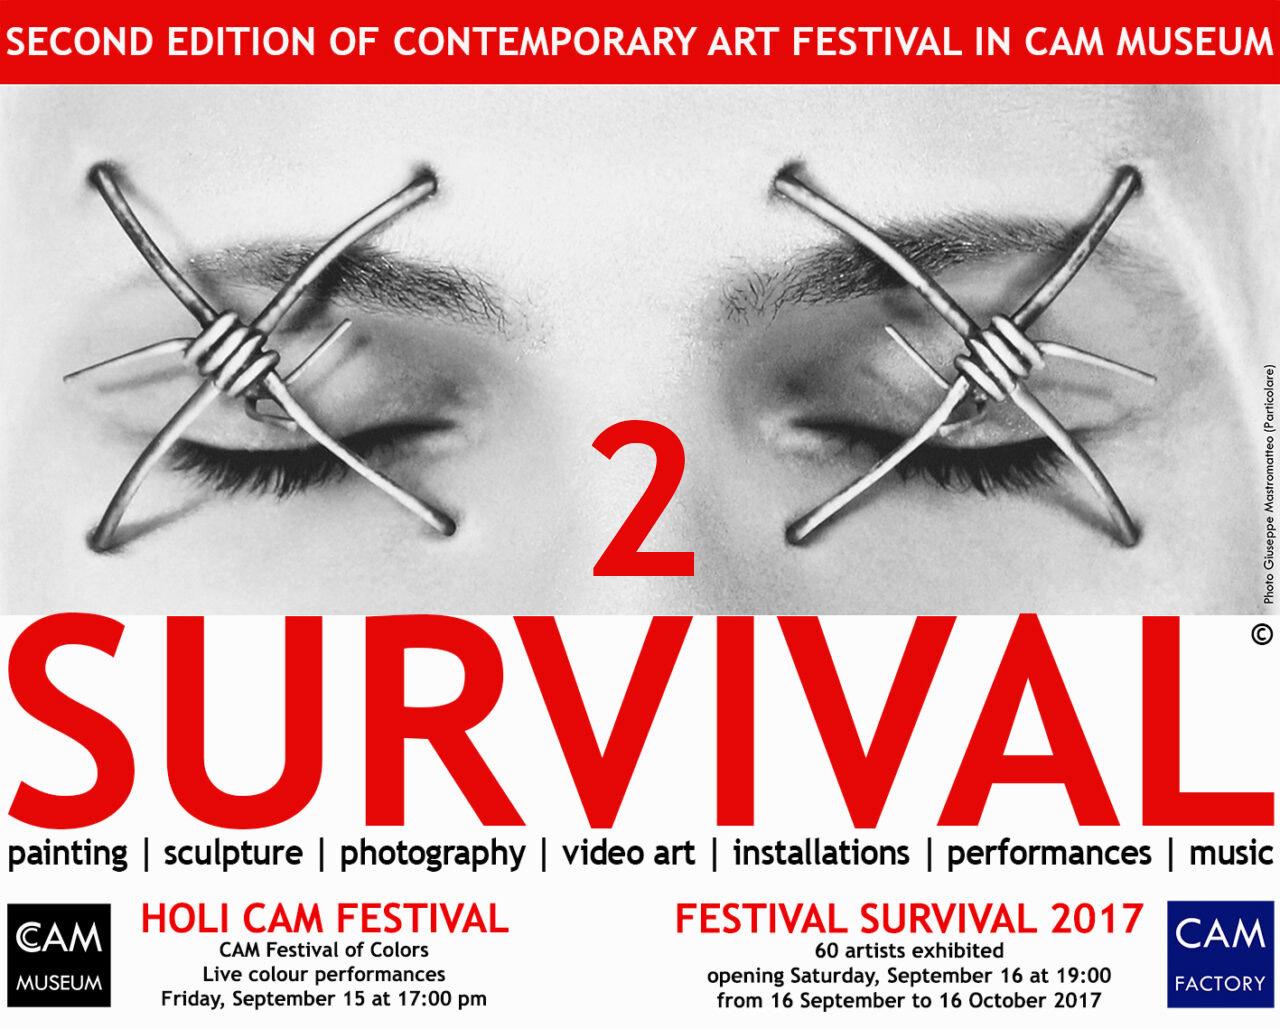 FESTIVAL SURVIVAL 2017